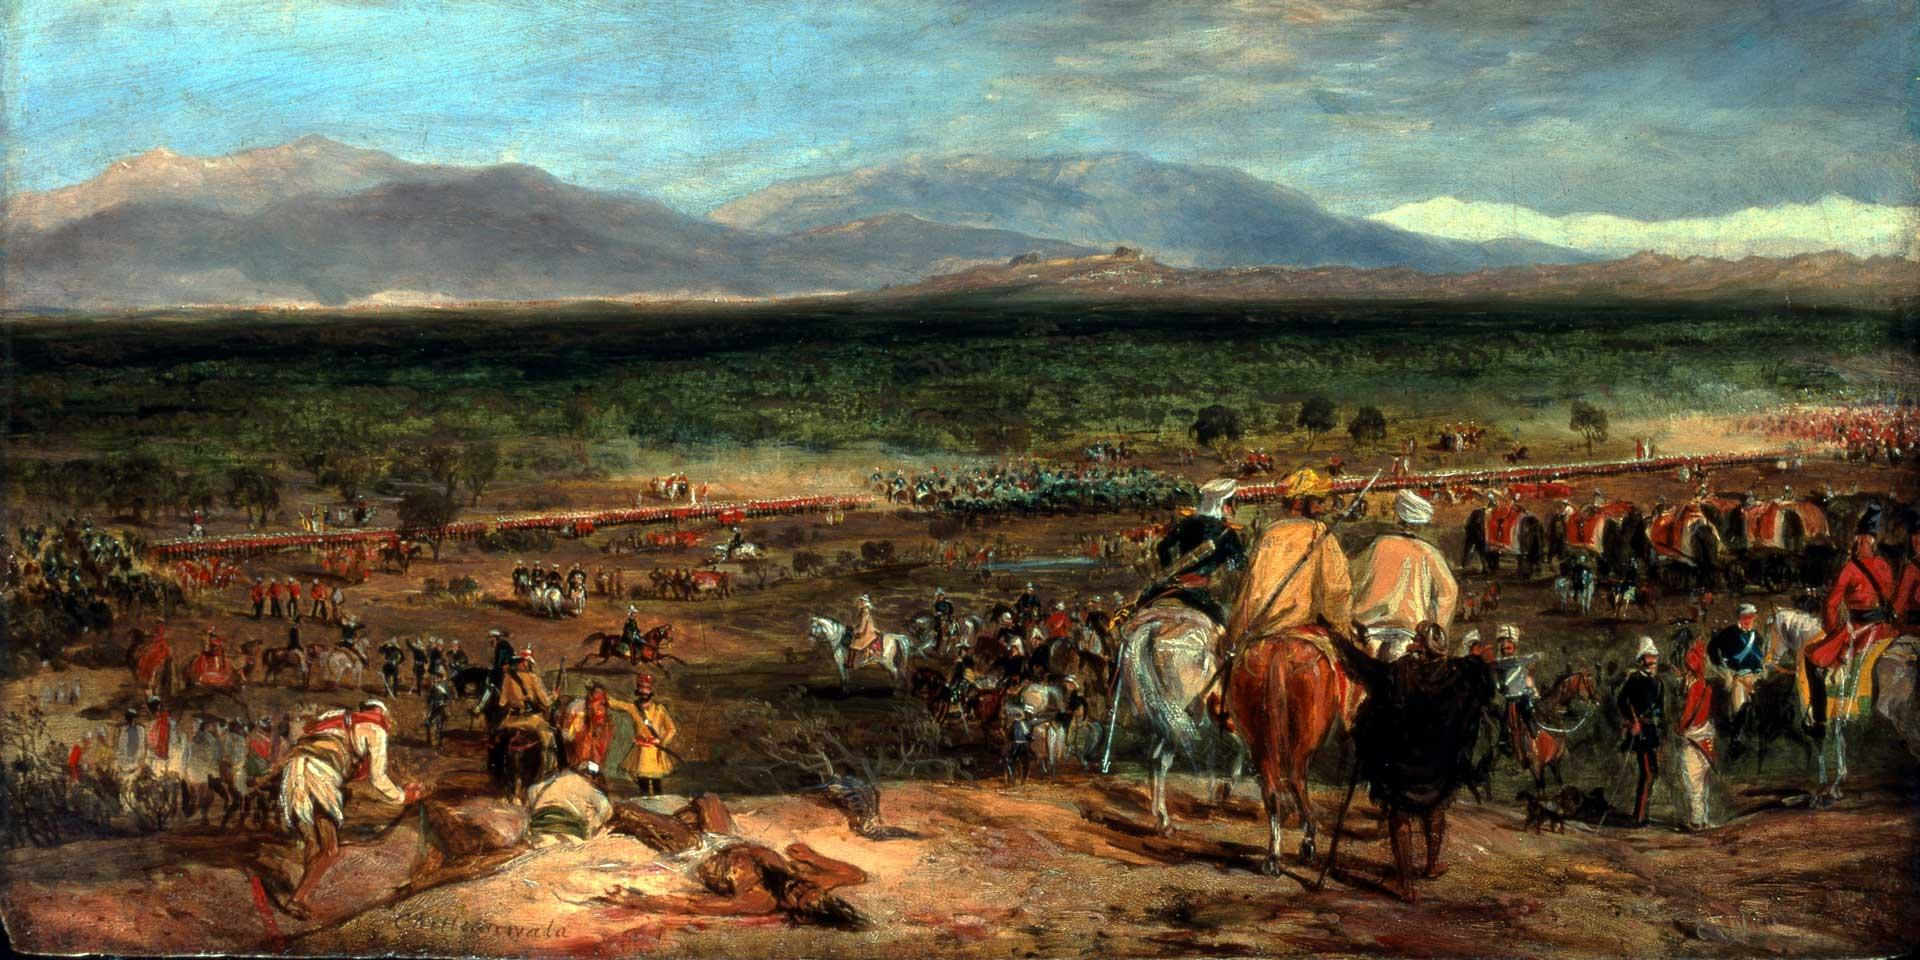 The Battle of Chillianwala, 13 January 1849